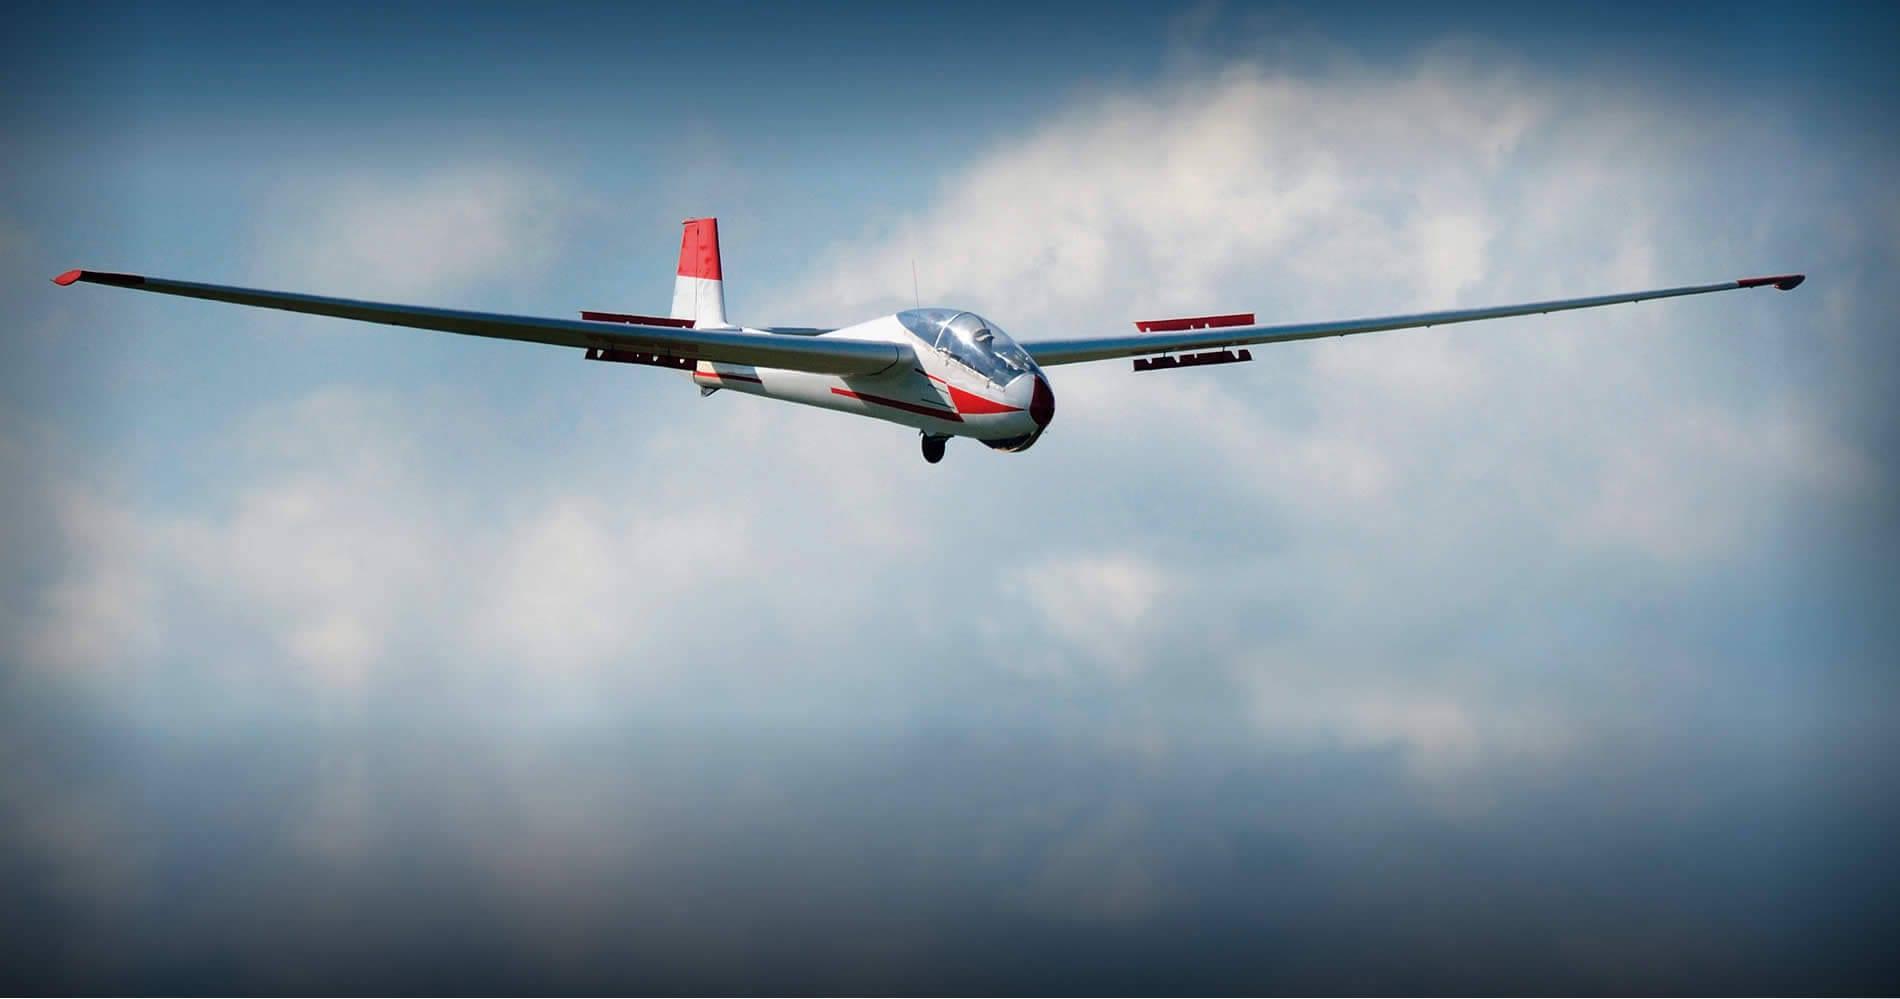 flugschule-austrian-pilots-academy-salzburg-8